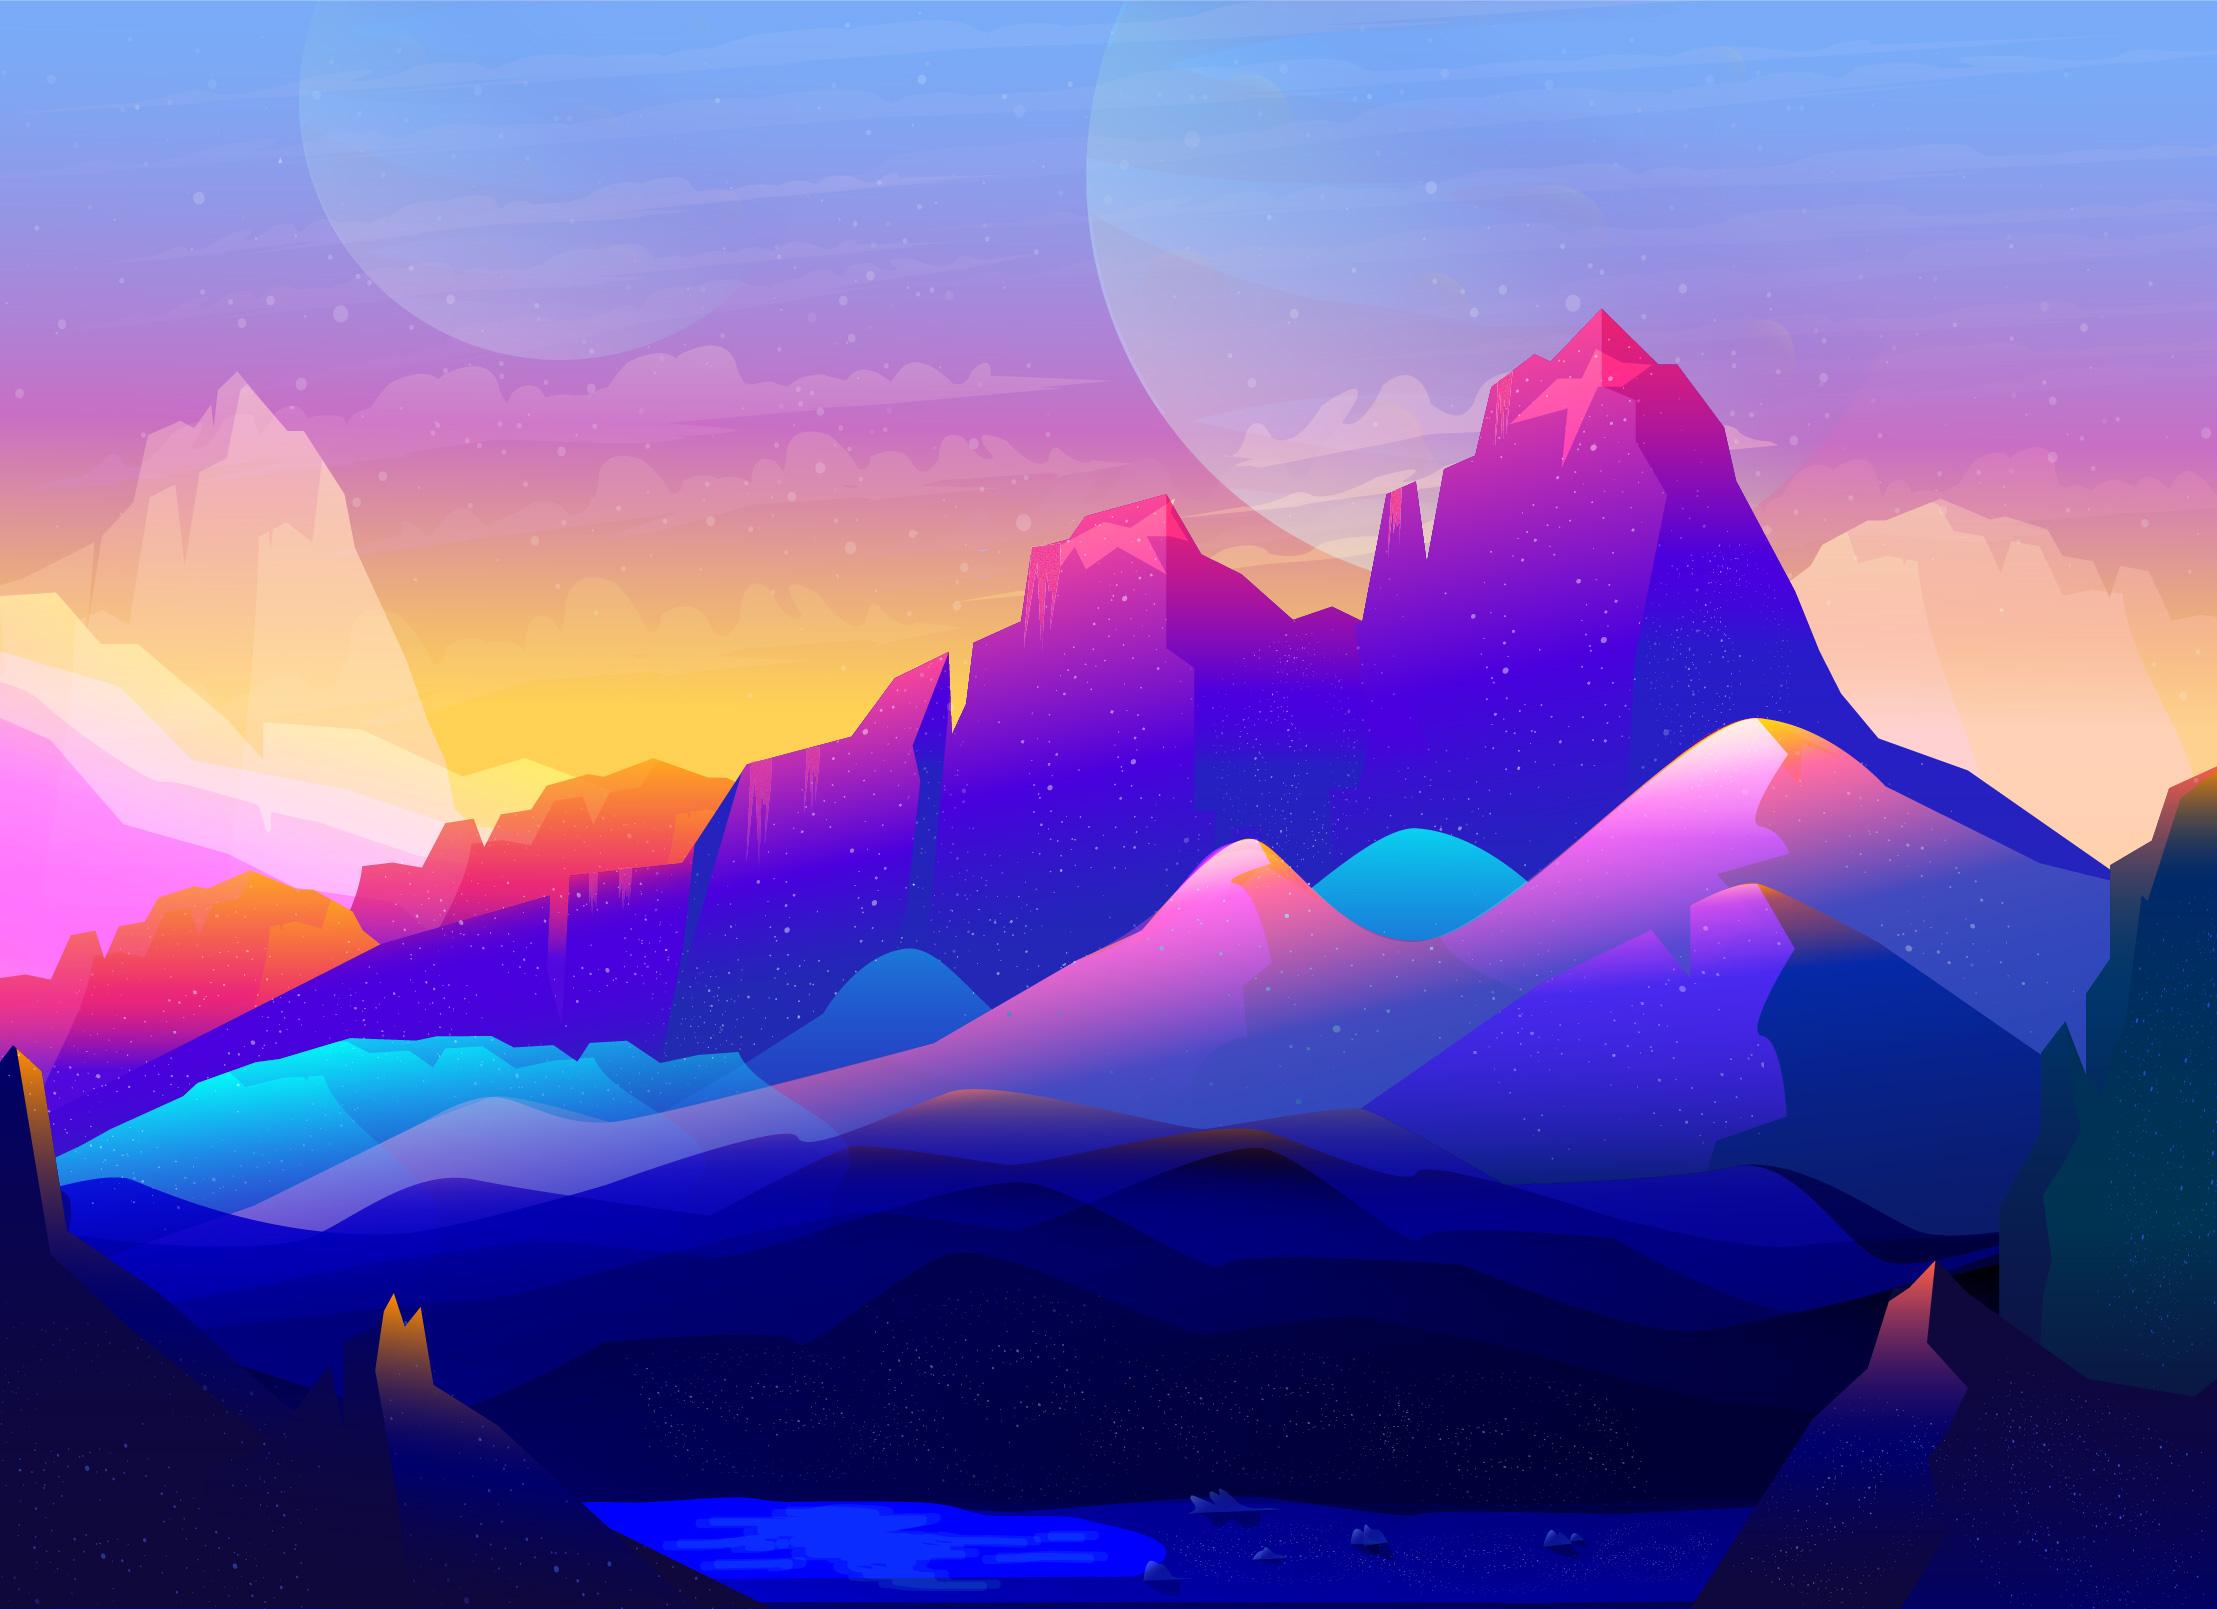 Wallpaper Mountain Minimal Half Moon Hd Creative: Rock Mountains Landscape Colorful Illustration Minimalist